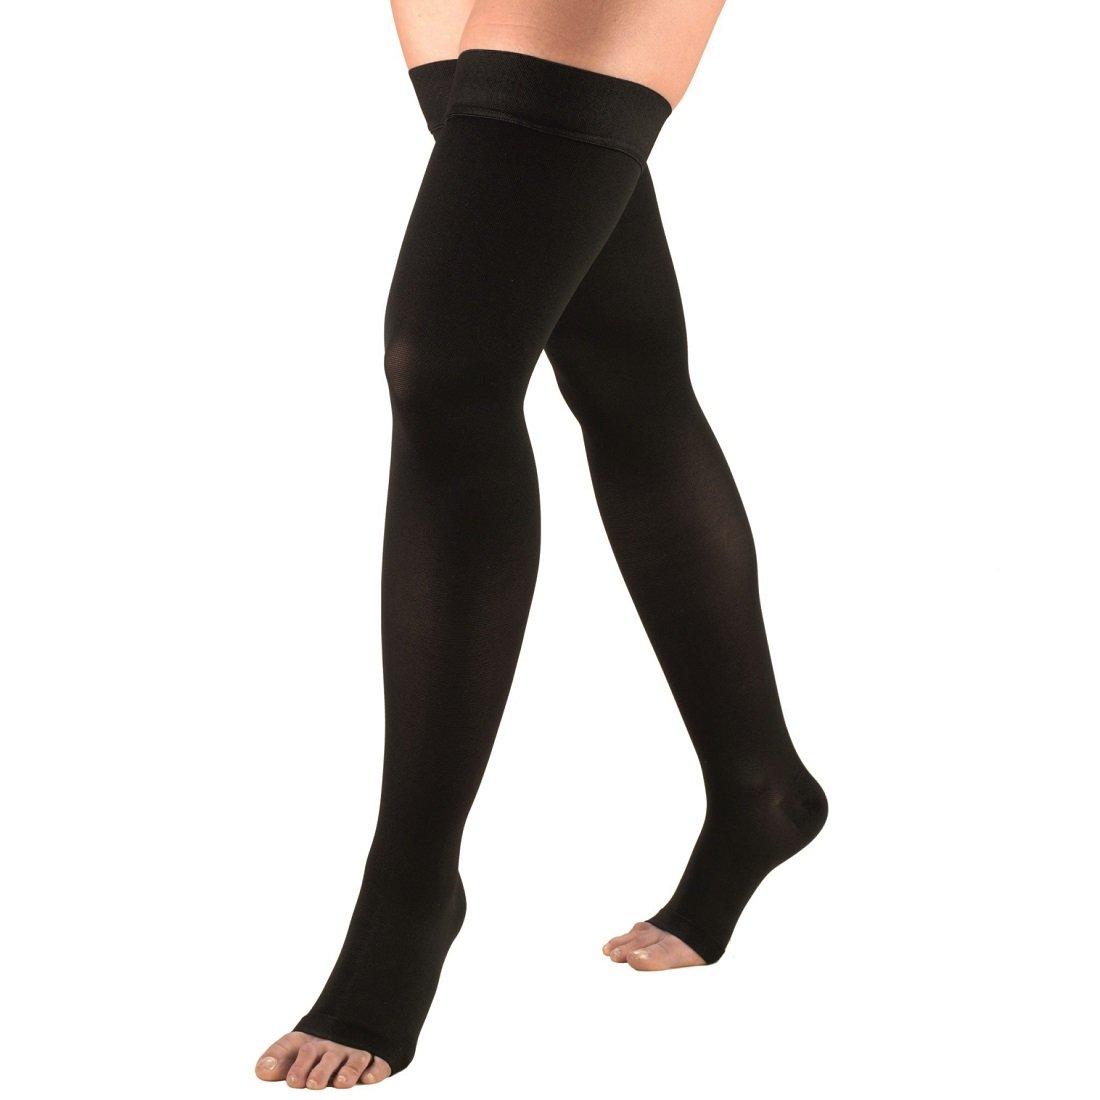 Sira Medical Antiskid Open Toe Varicose Stocking, Grade-l (15-21mmHg) Above Knee Lower Pressure, Reduce Leg & Calf Pain & Swelling, Varicose Veins Socks, Compression Socks for Veins.(M/L/XL/XXL)